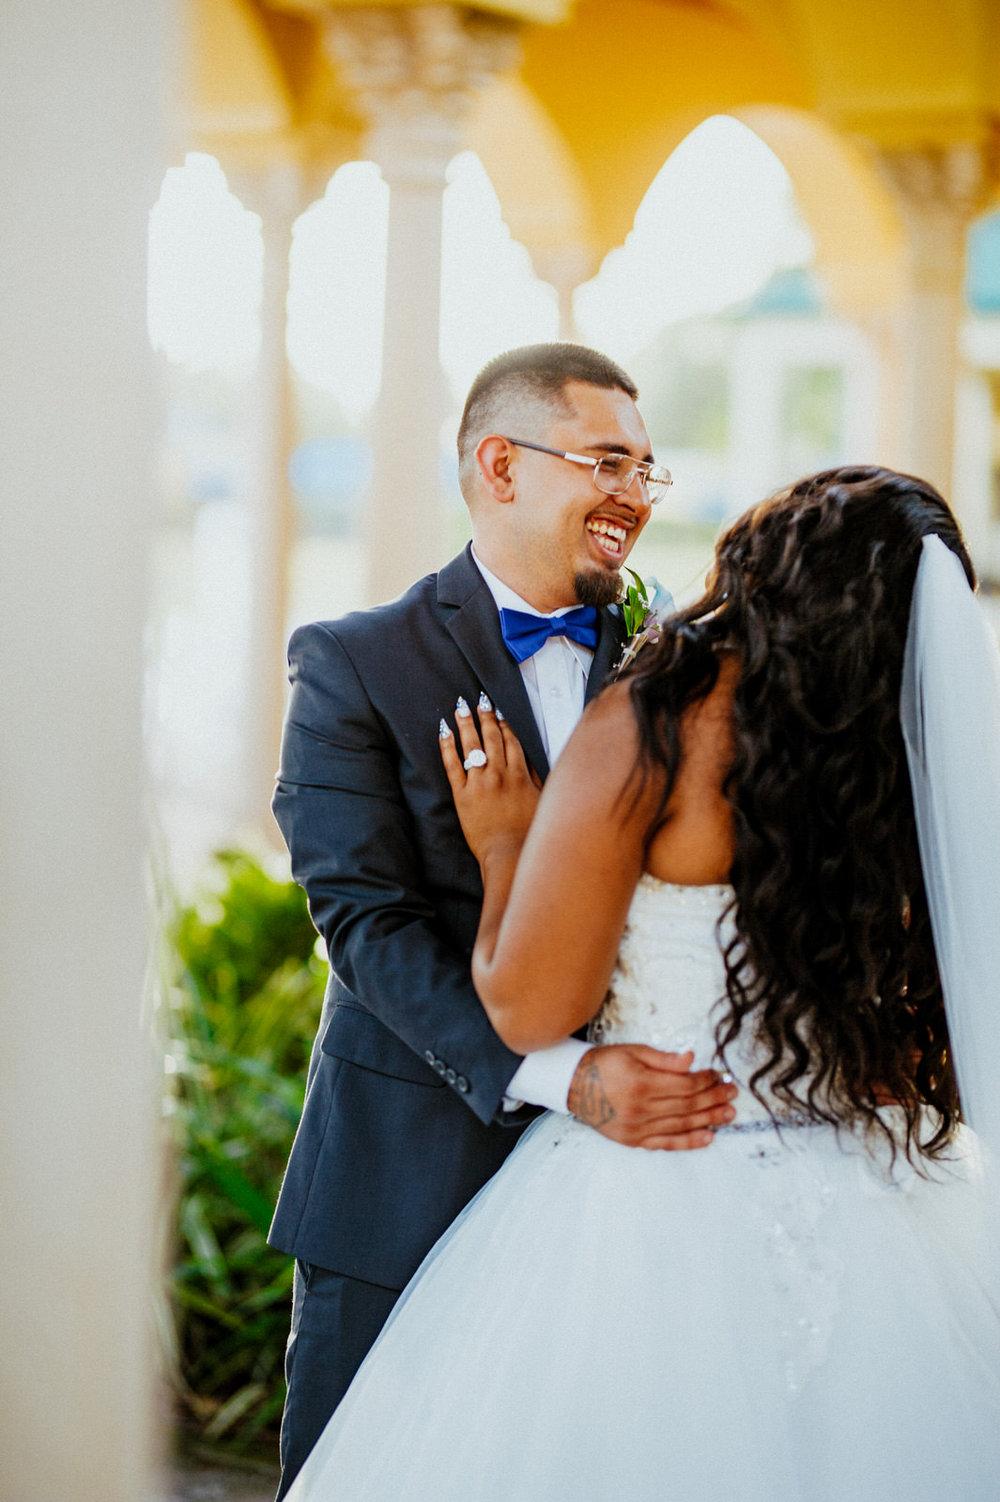 McNeile_Photography_Wedding_Tampa111-1.jpg